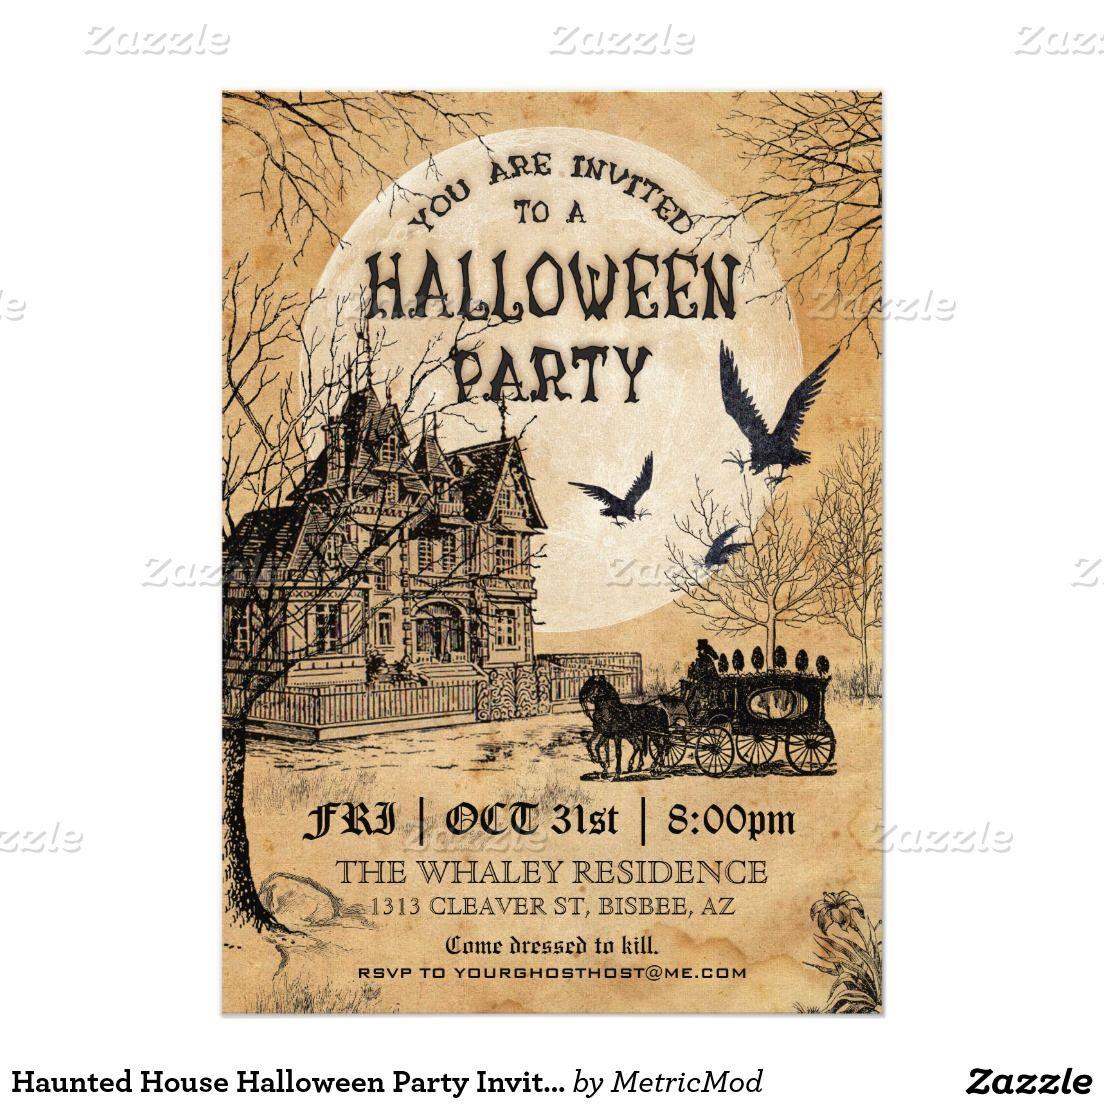 Haunted House Halloween Party Invitation has a retro vintage look ...